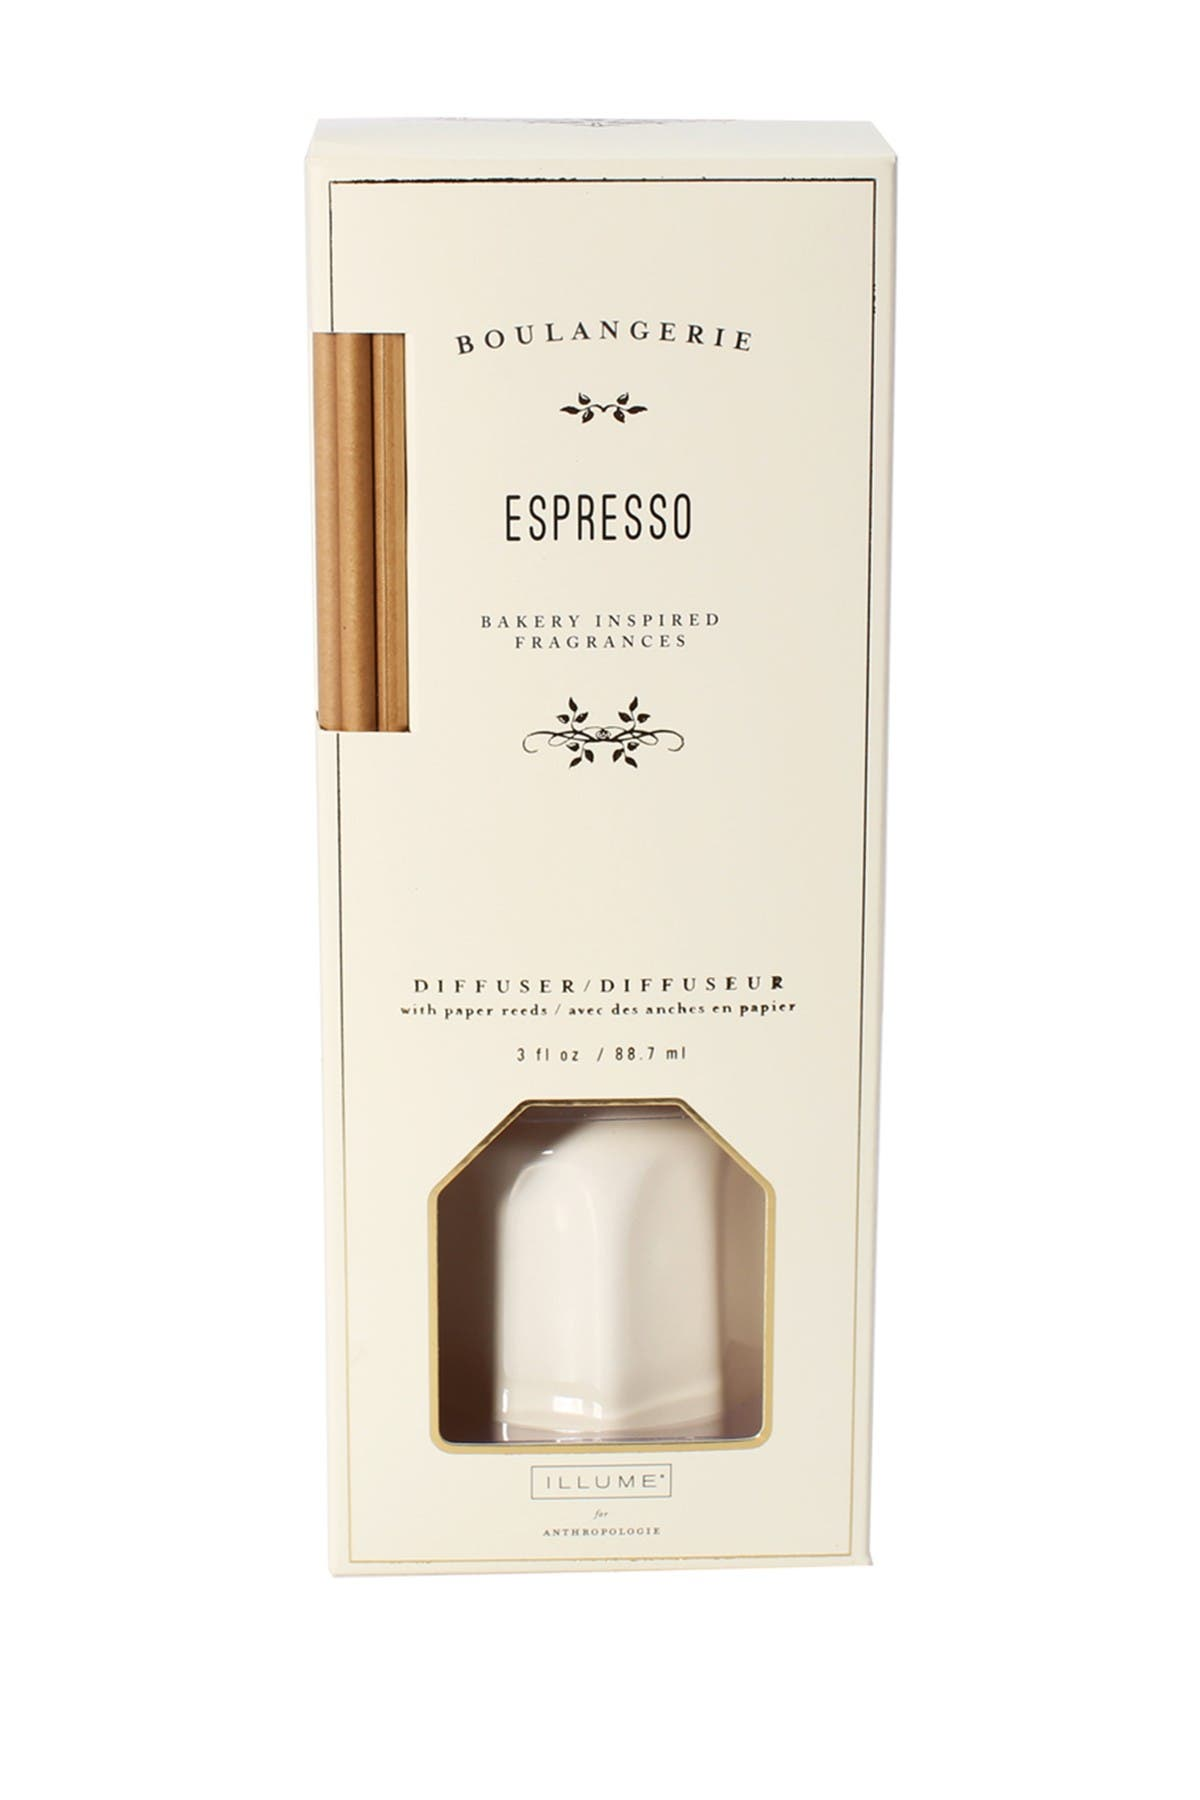 Image of ANTHROPOLOGIE Espresso Boulangerie Diffuser